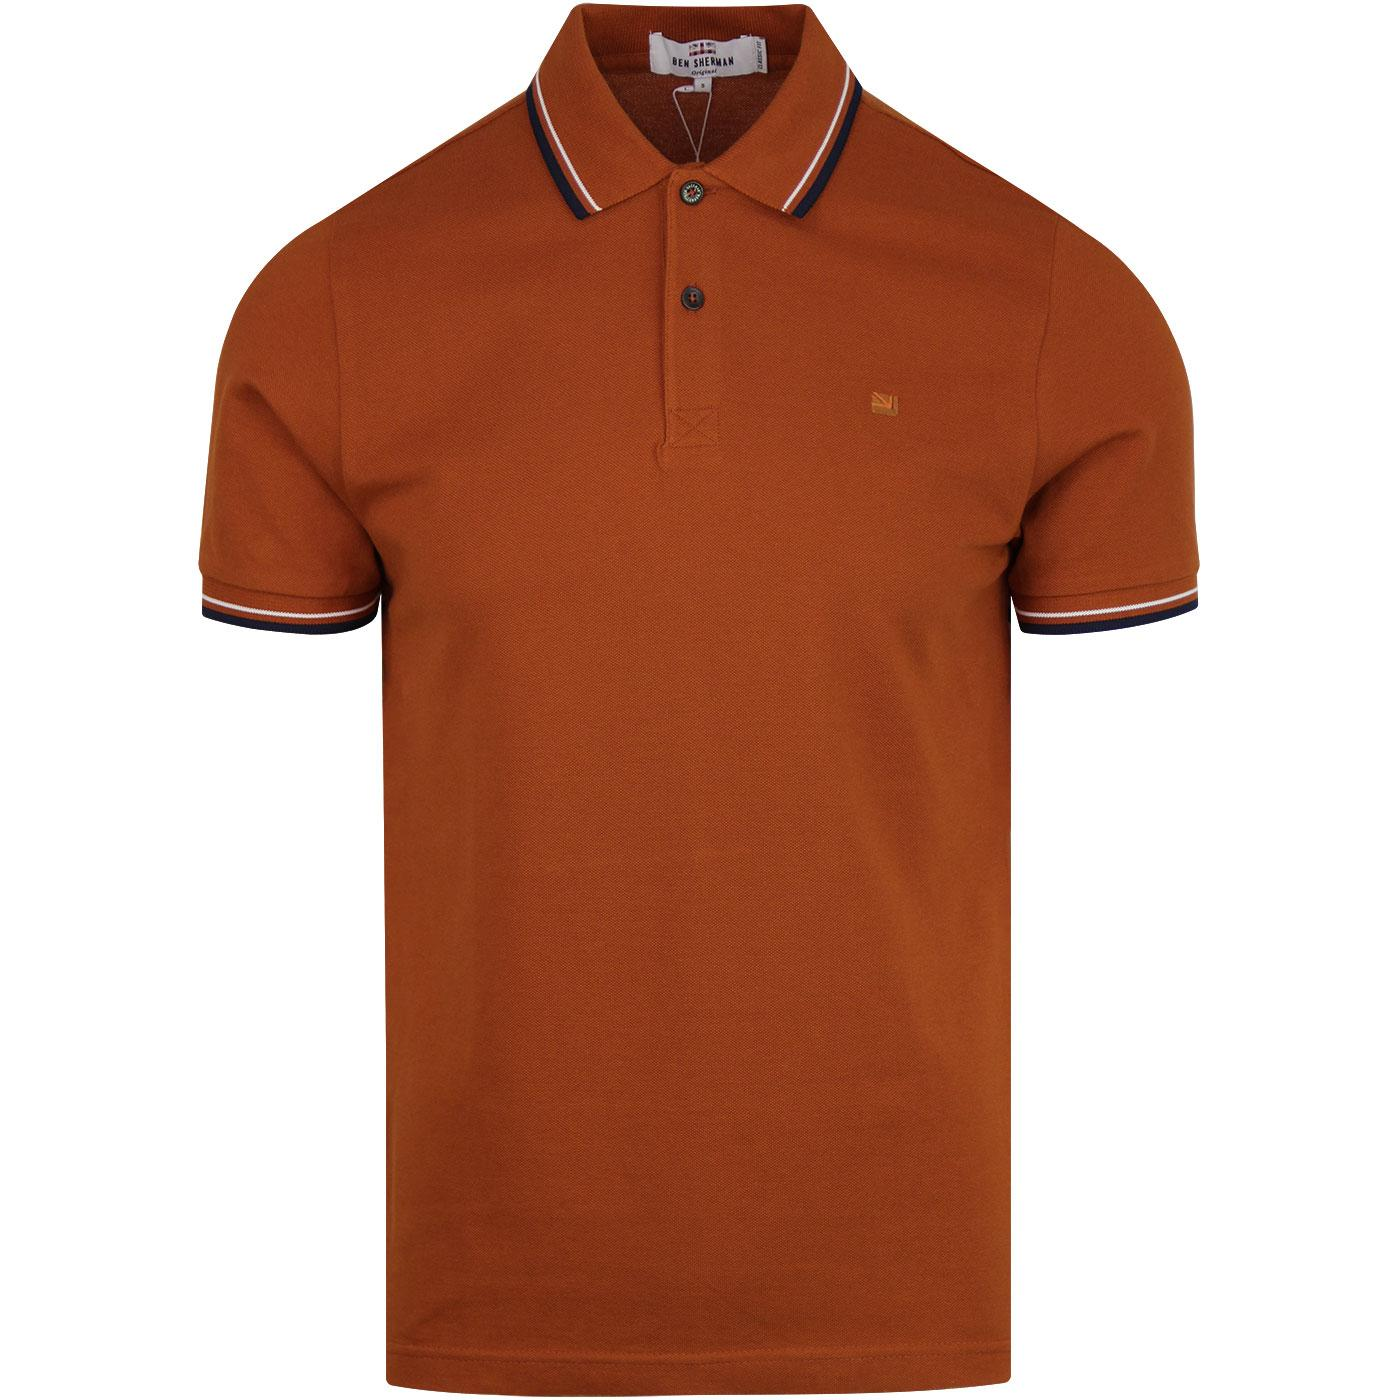 Romford BEN SHERMAN Mod Pique Polo Shirt (Ochre)